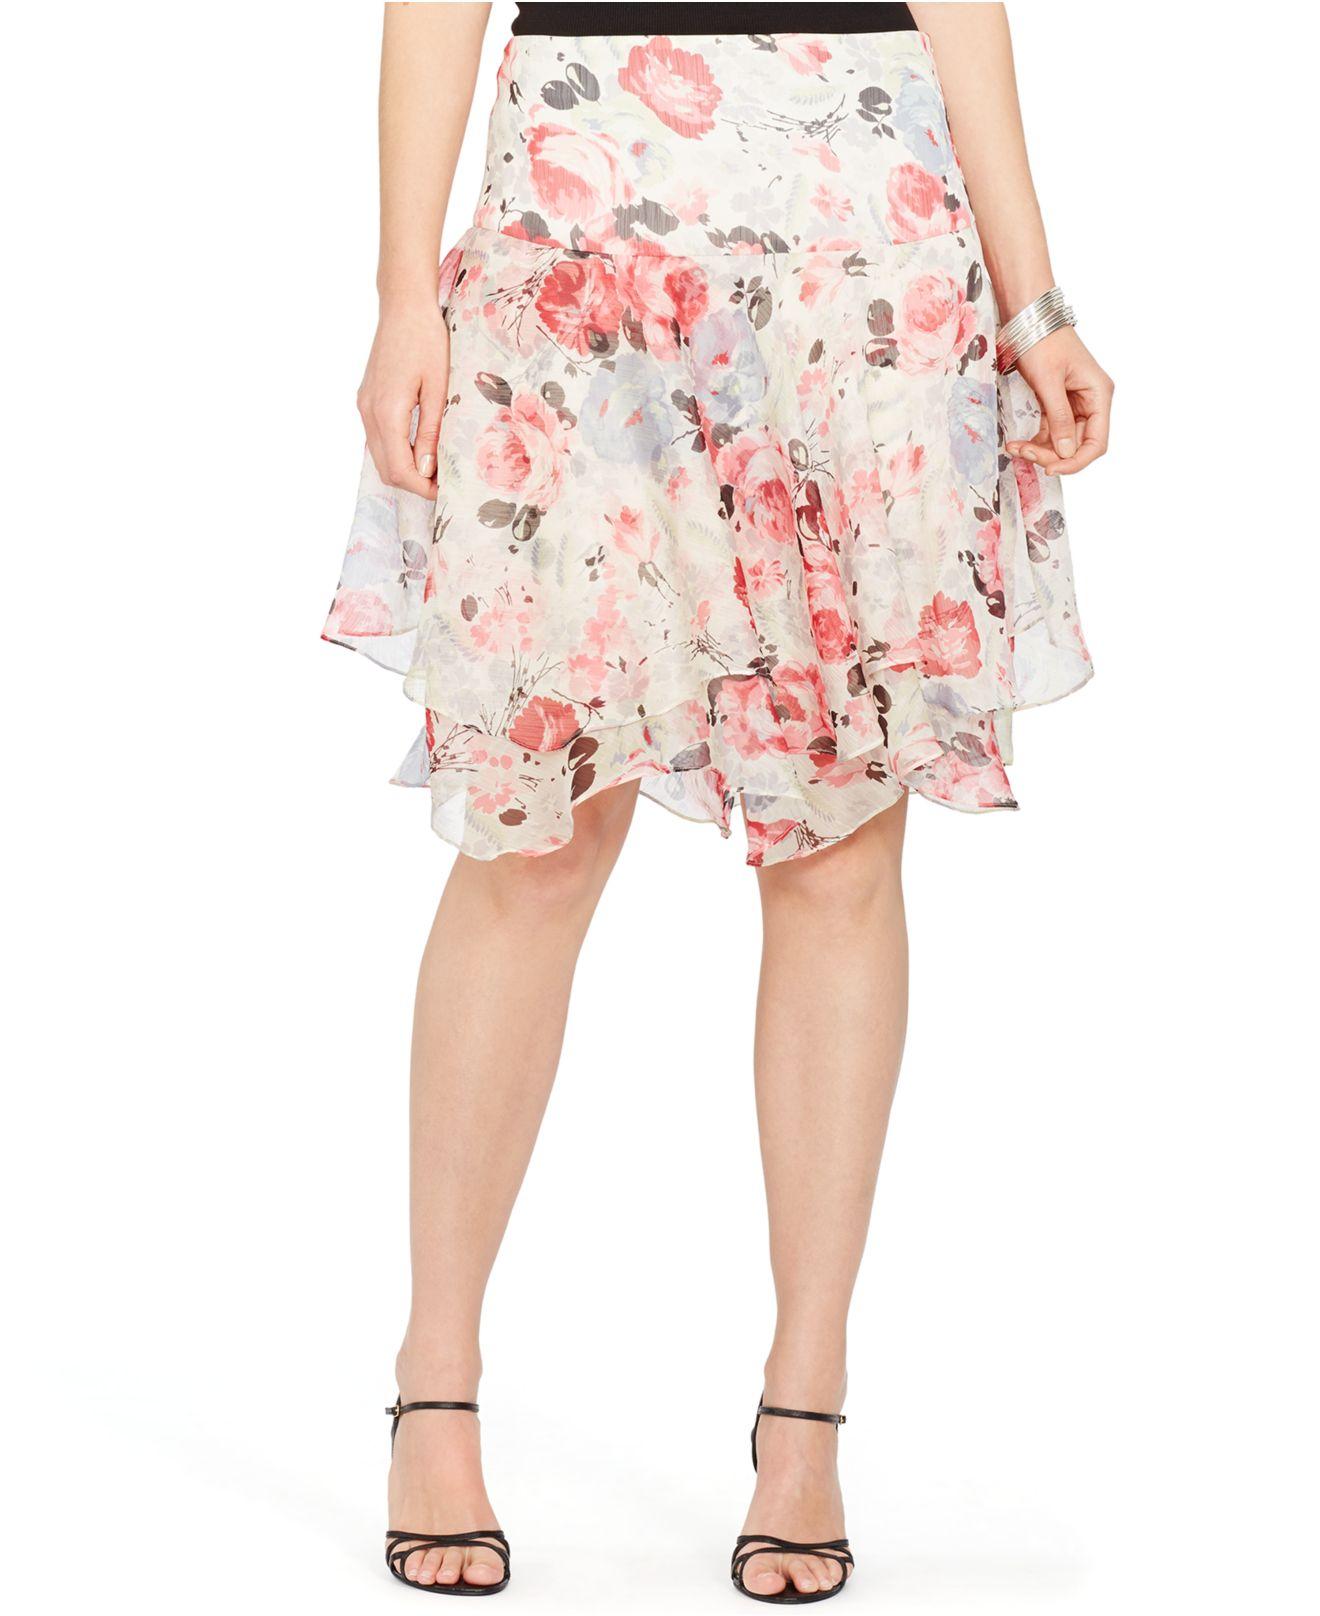 02abc33dcefcf Lyst - Lauren by Ralph Lauren Plus Size Floral-Print Tiered Skirt